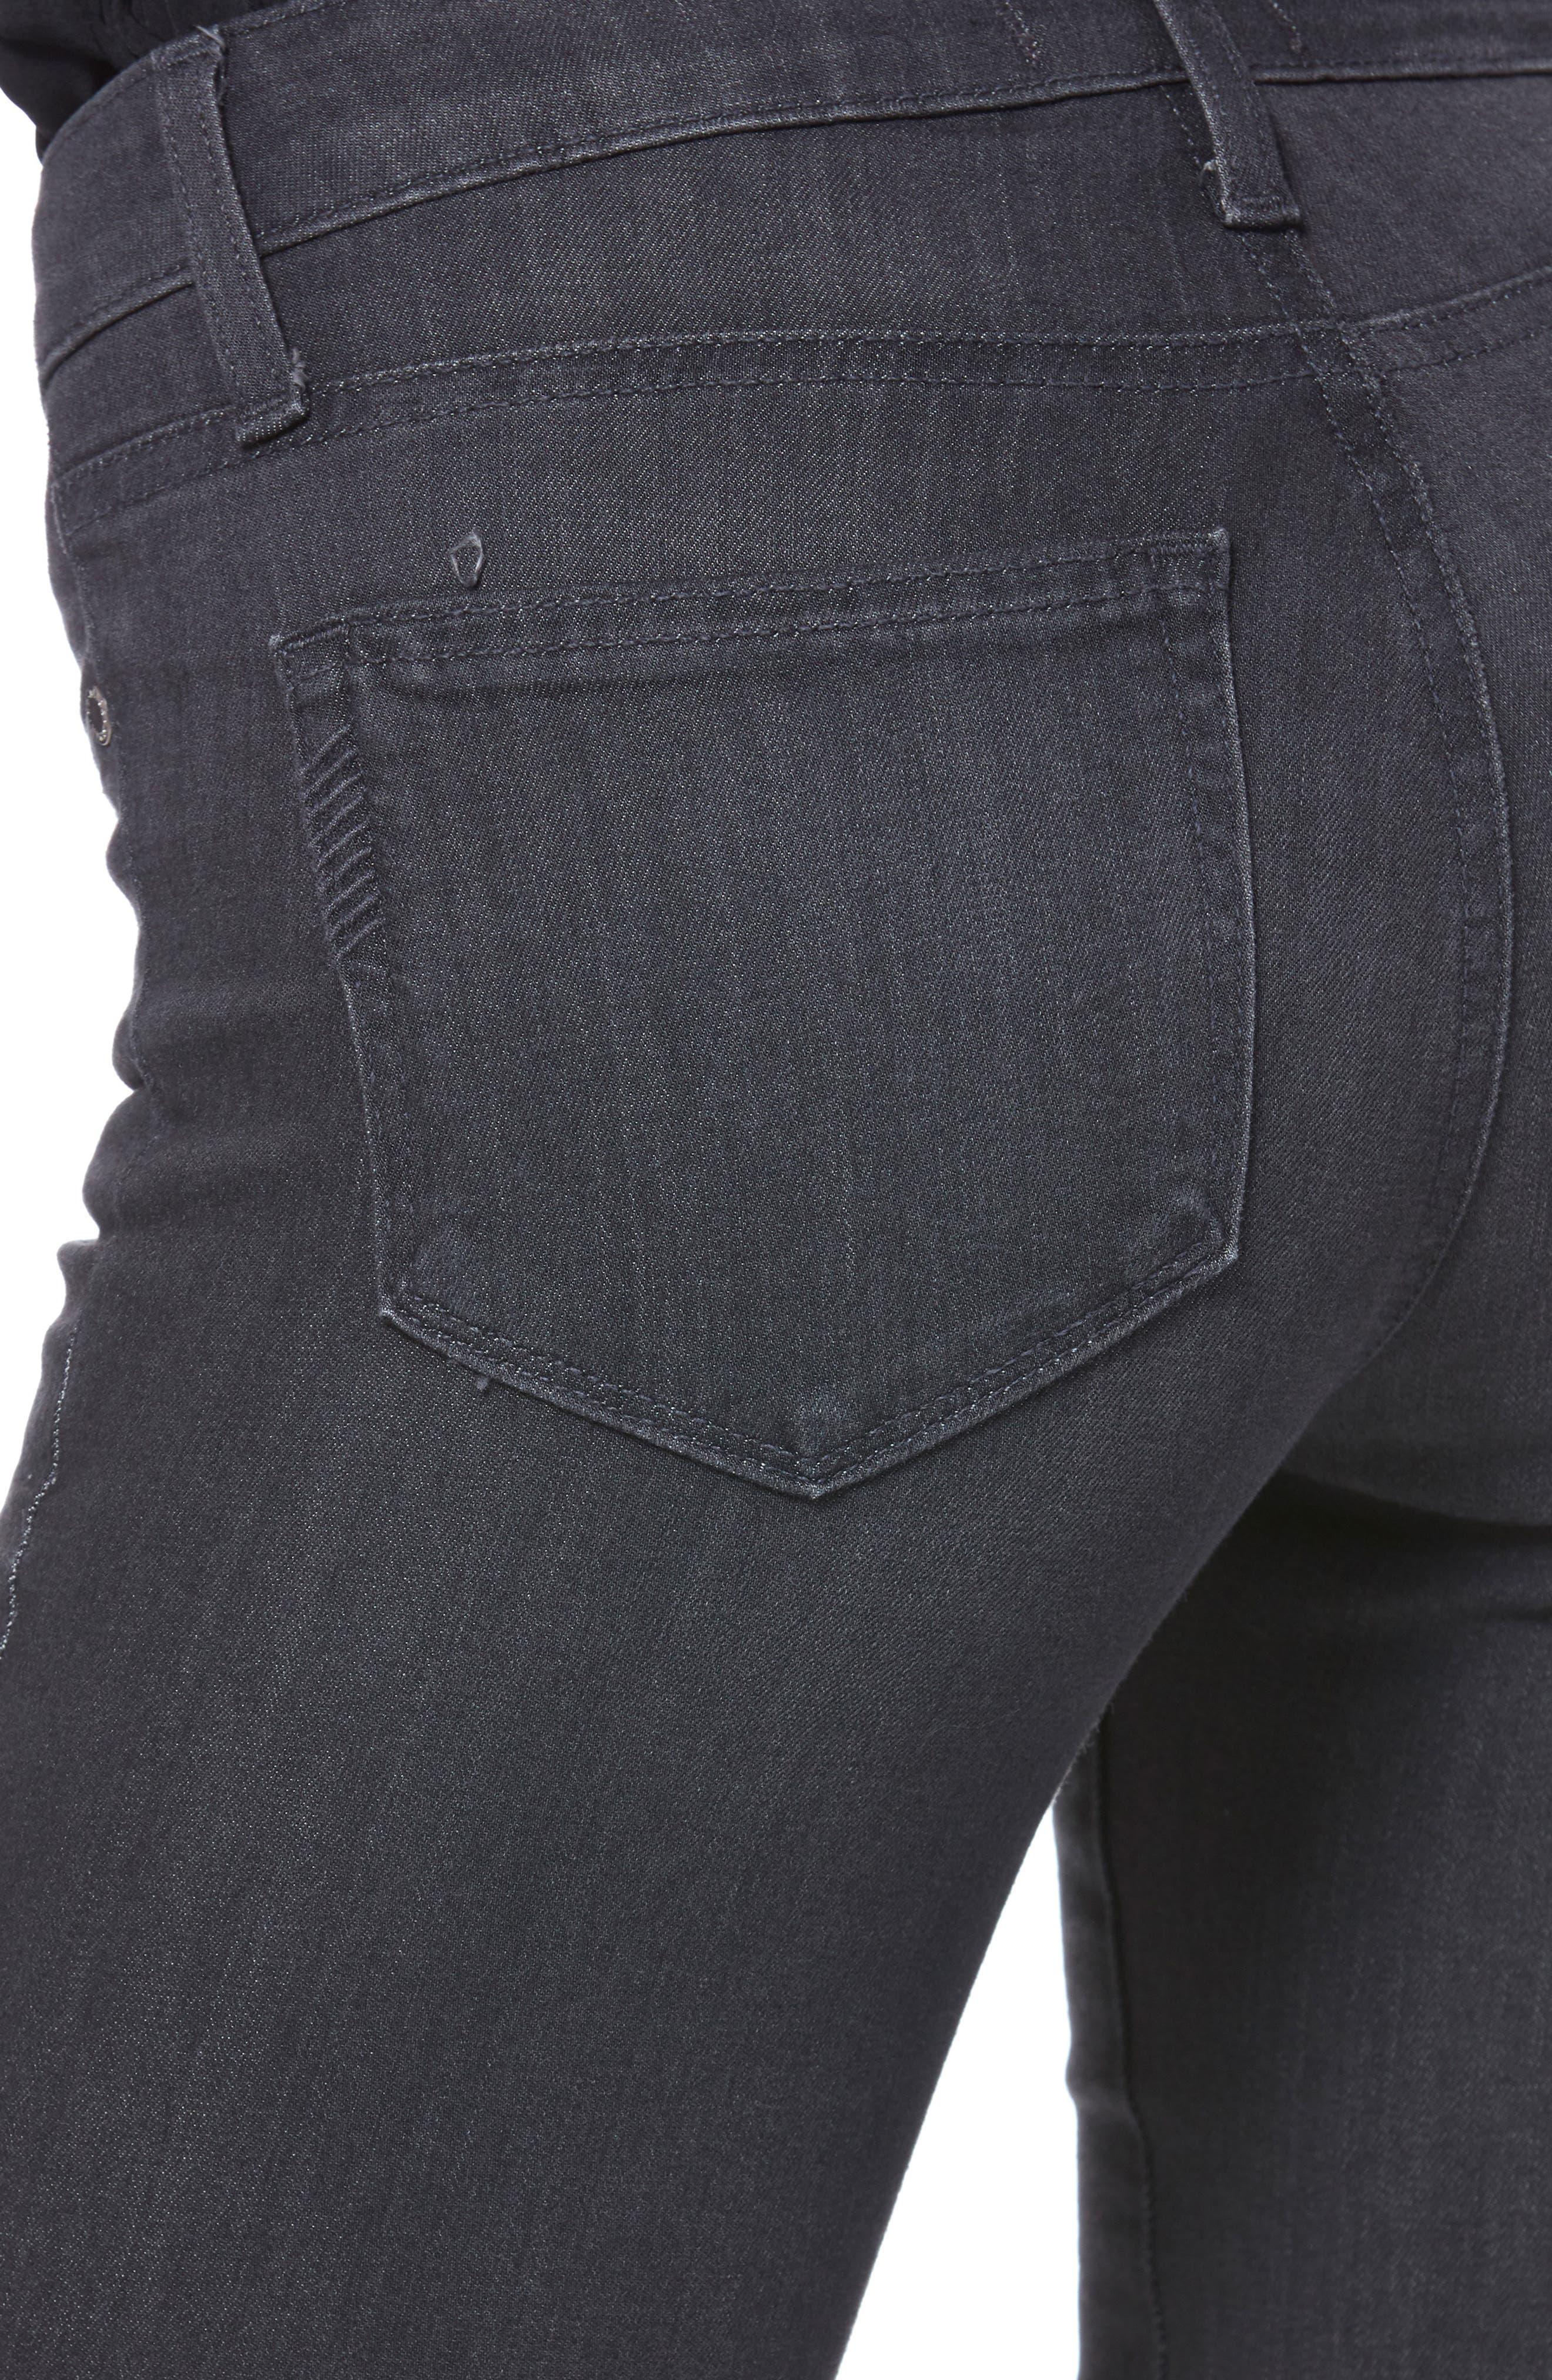 Transcend - Leggy Ultra Skinny Jeans,                             Alternate thumbnail 4, color,                             GREY PEAKS